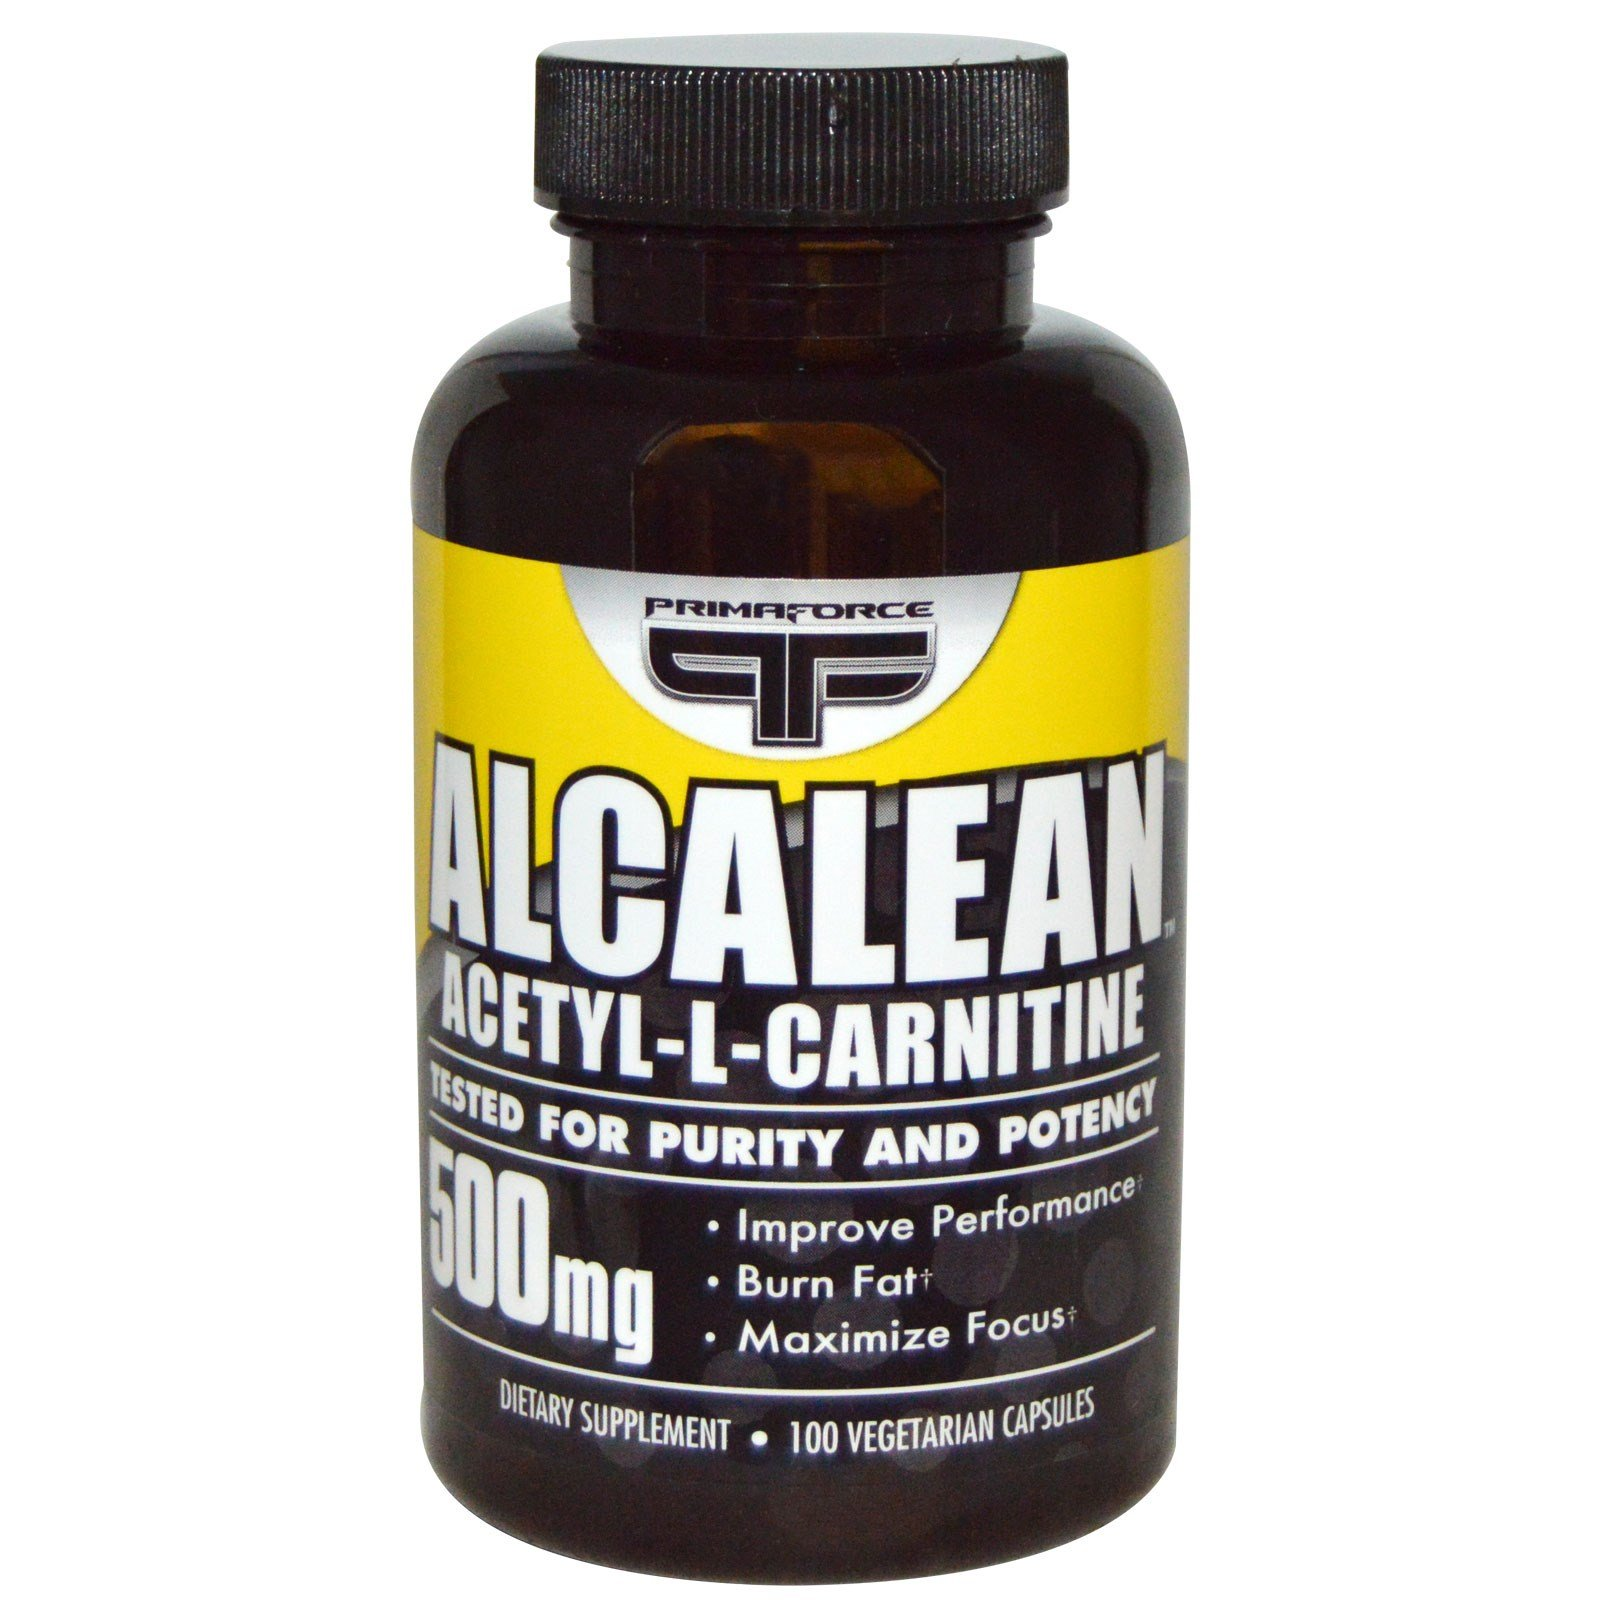 Primaforce, Alcalean, Acetyl-L-Carnitine, 500 mg, 100 Veggie Caps - 3PC